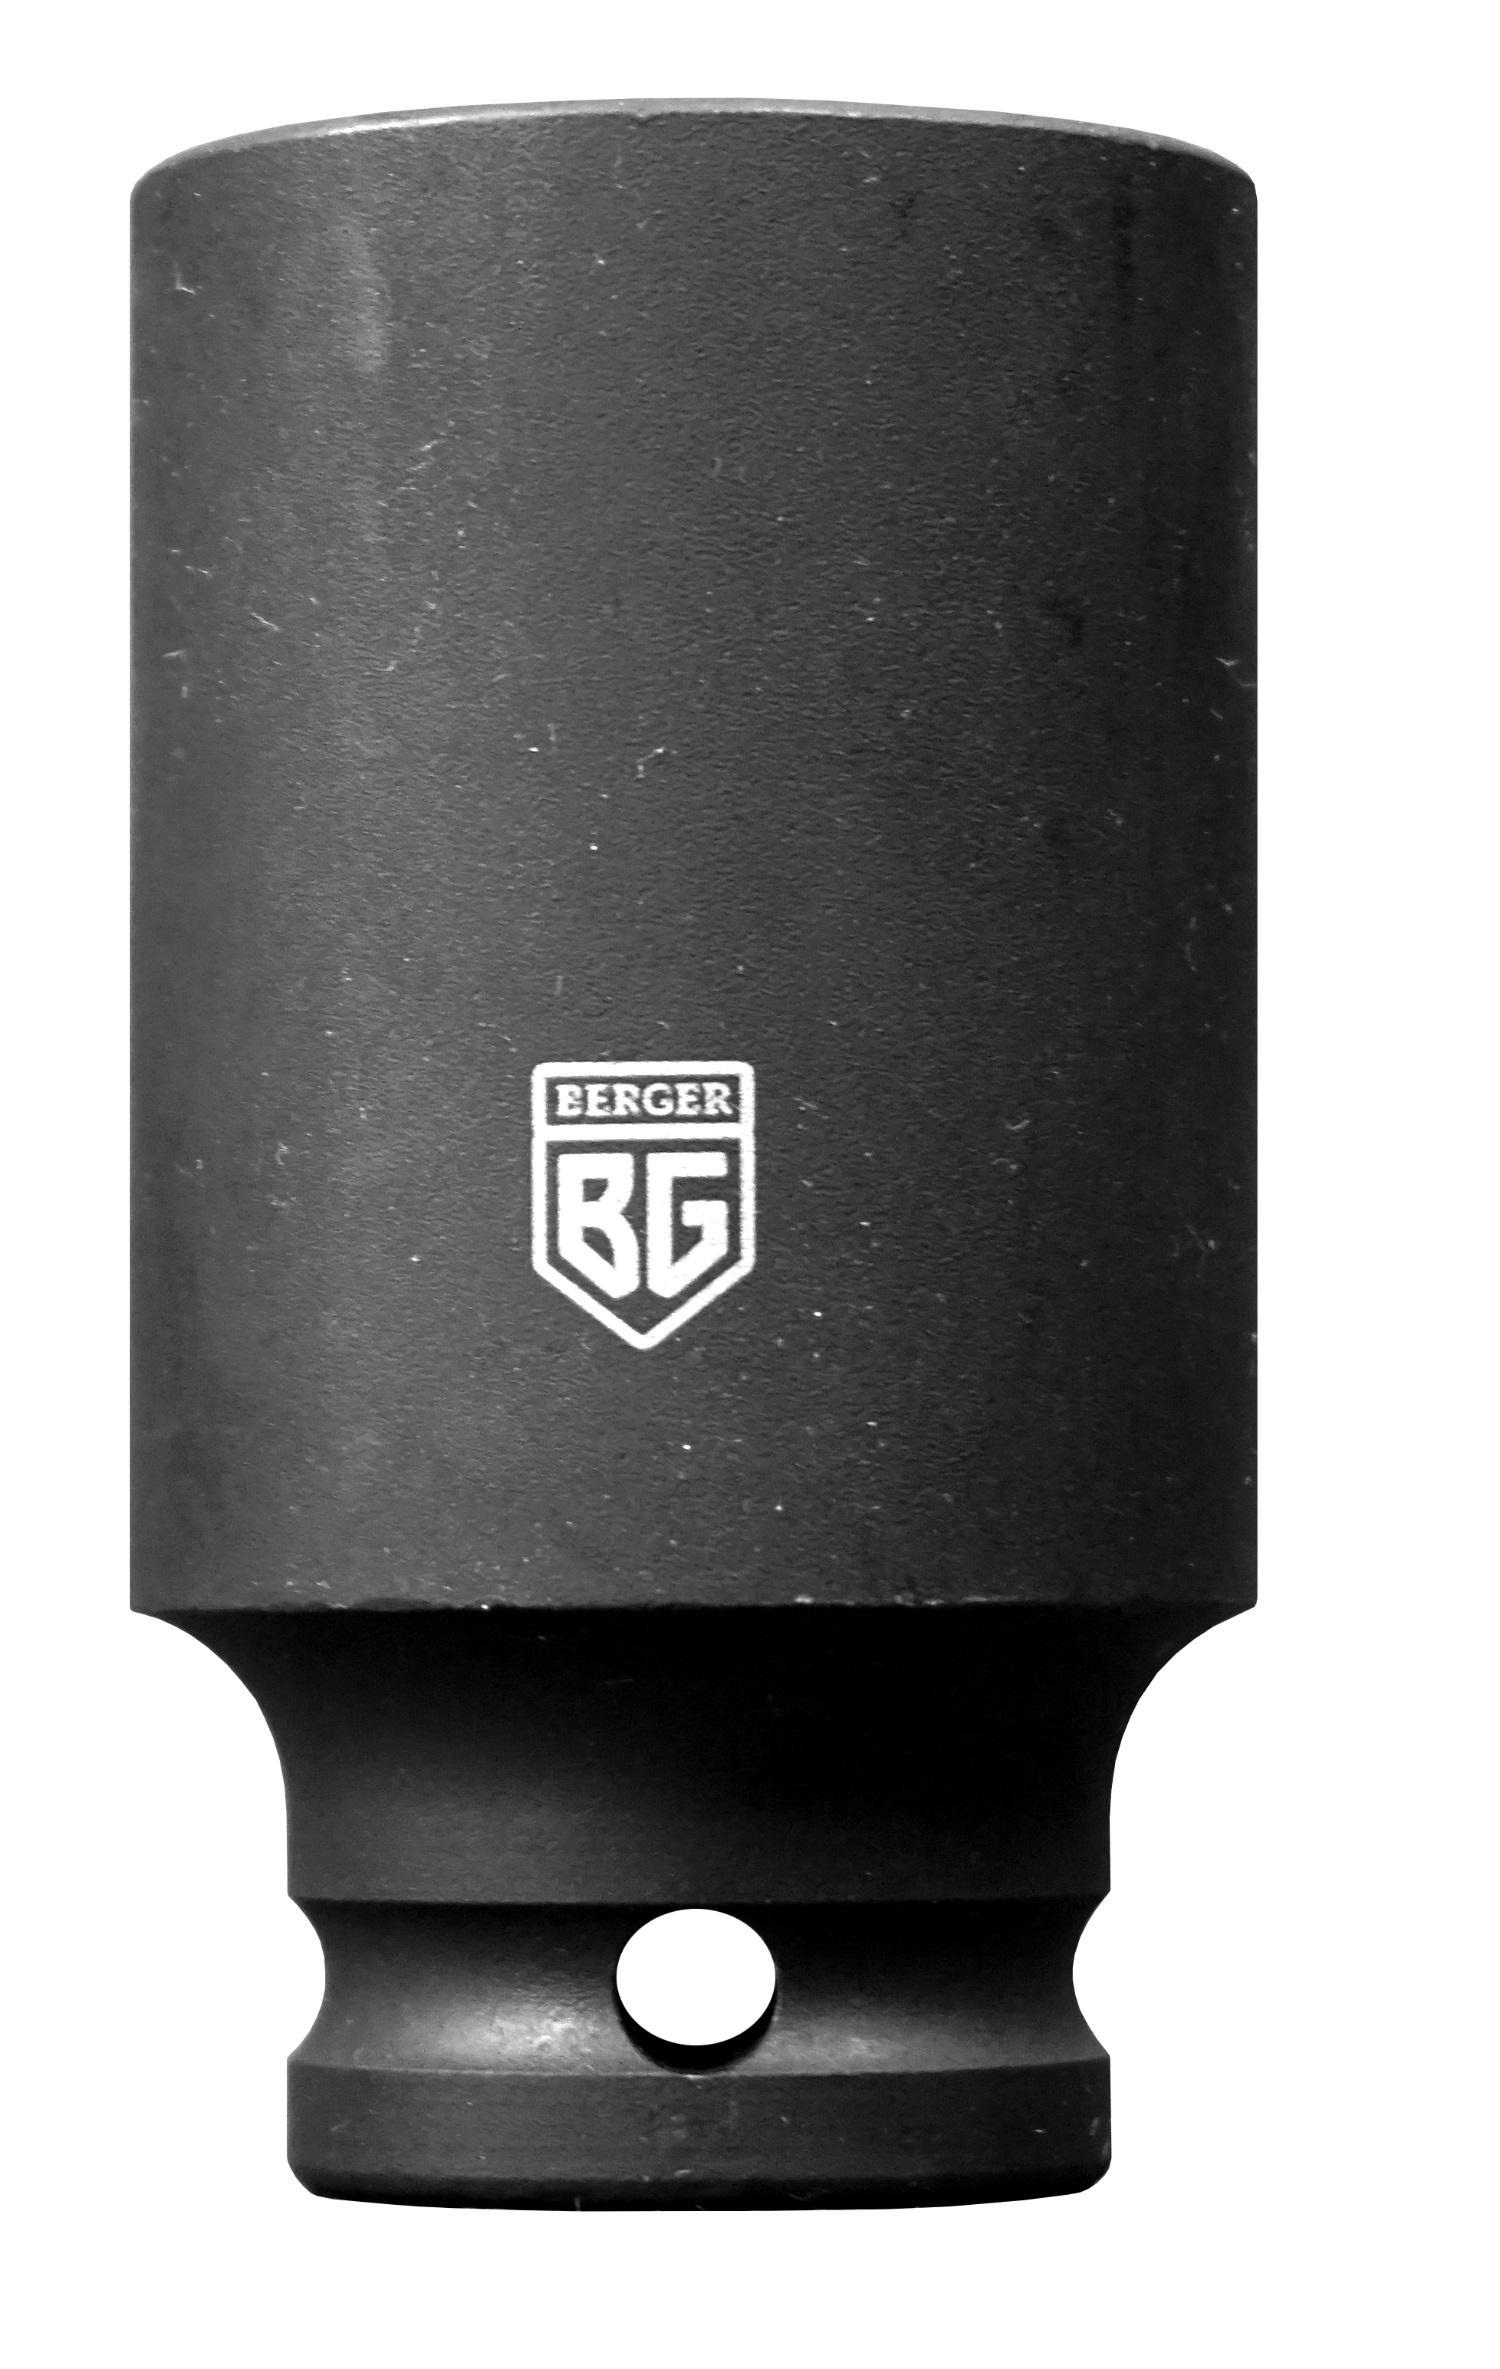 Головка торцевая Berger размер 11мм, h 75мм, s 1/2'' (bg2133) головка торцевая ударная berger bg2115 1 2 11мм